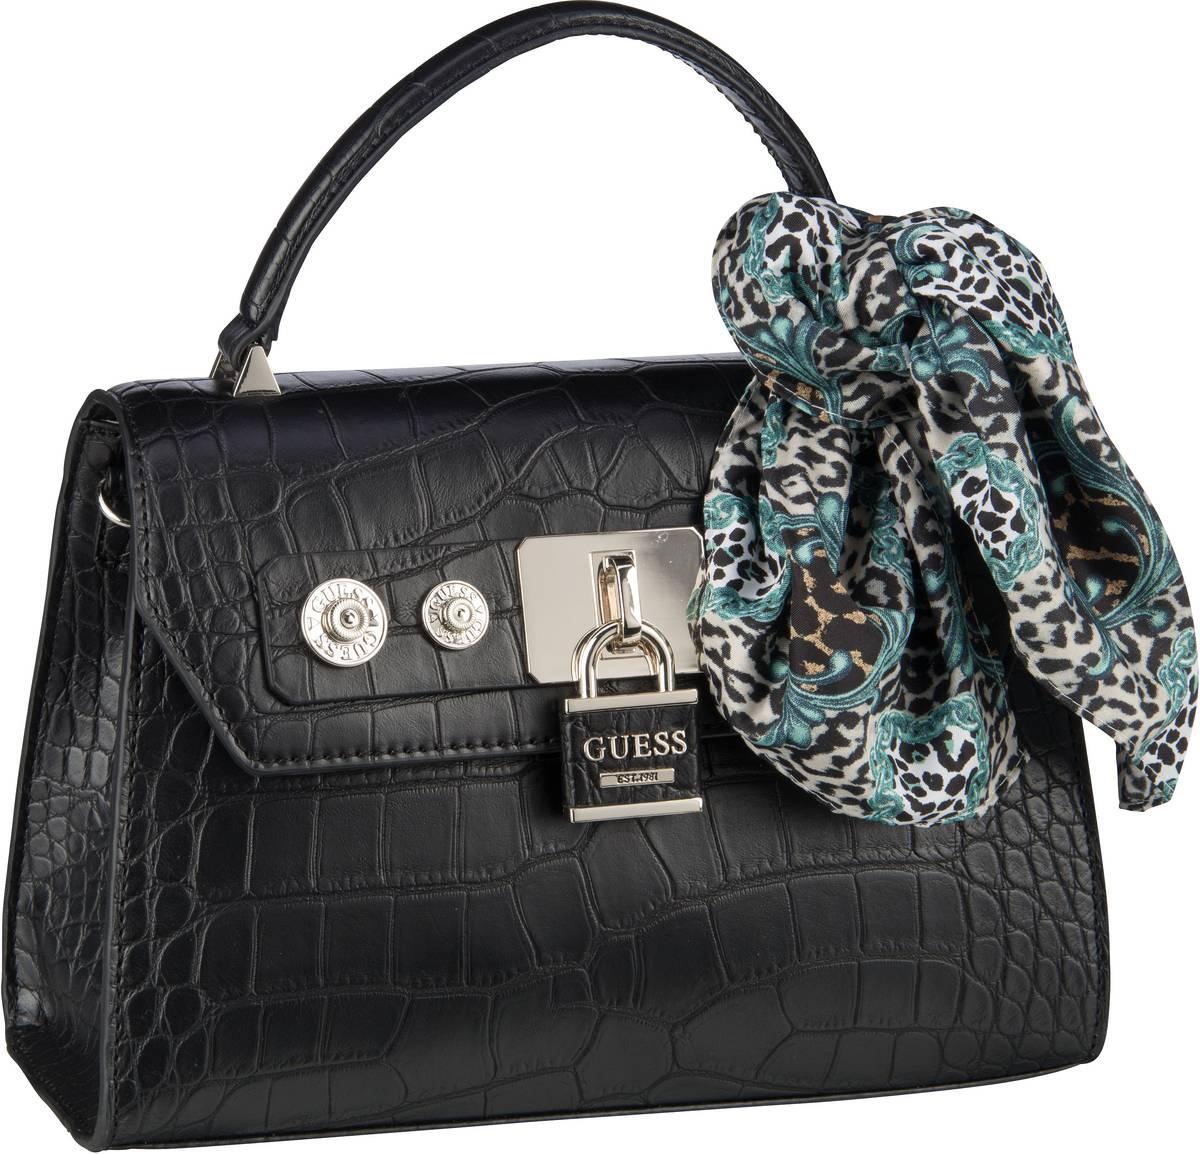 Handtasche Anne Marie Top Handle Flap Black